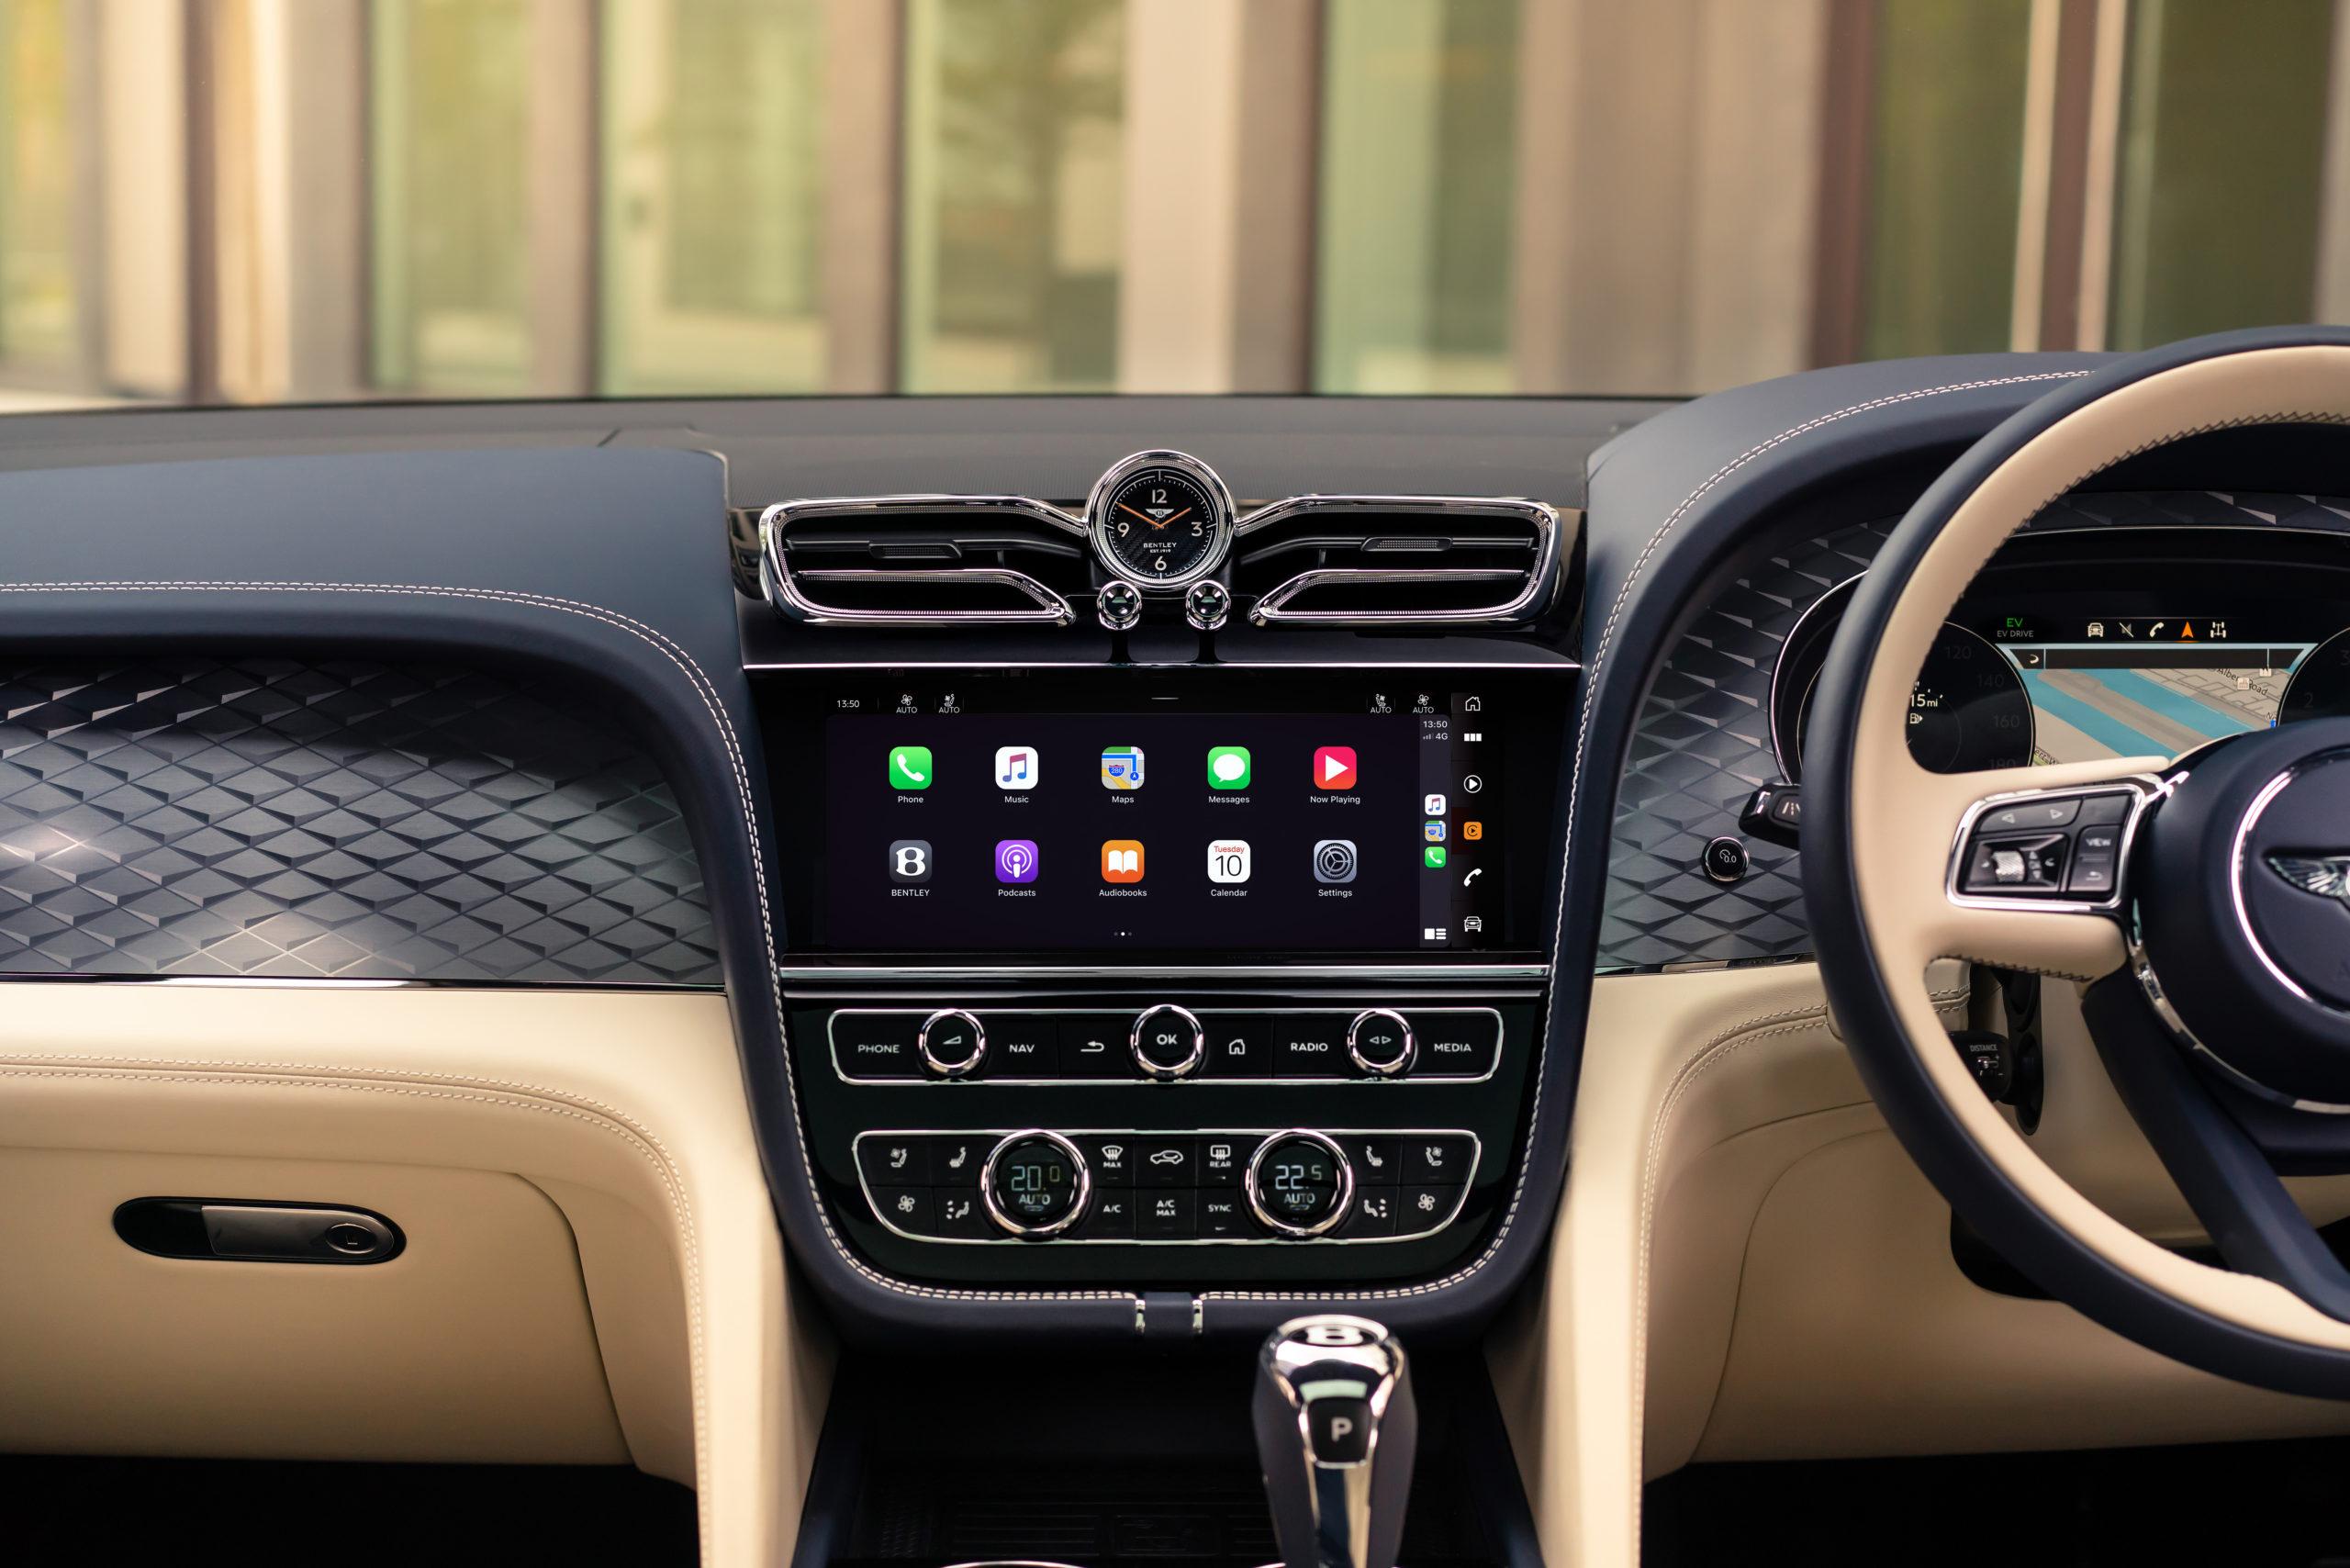 2021 Bentley Bentayga Hybrid infotainment screen